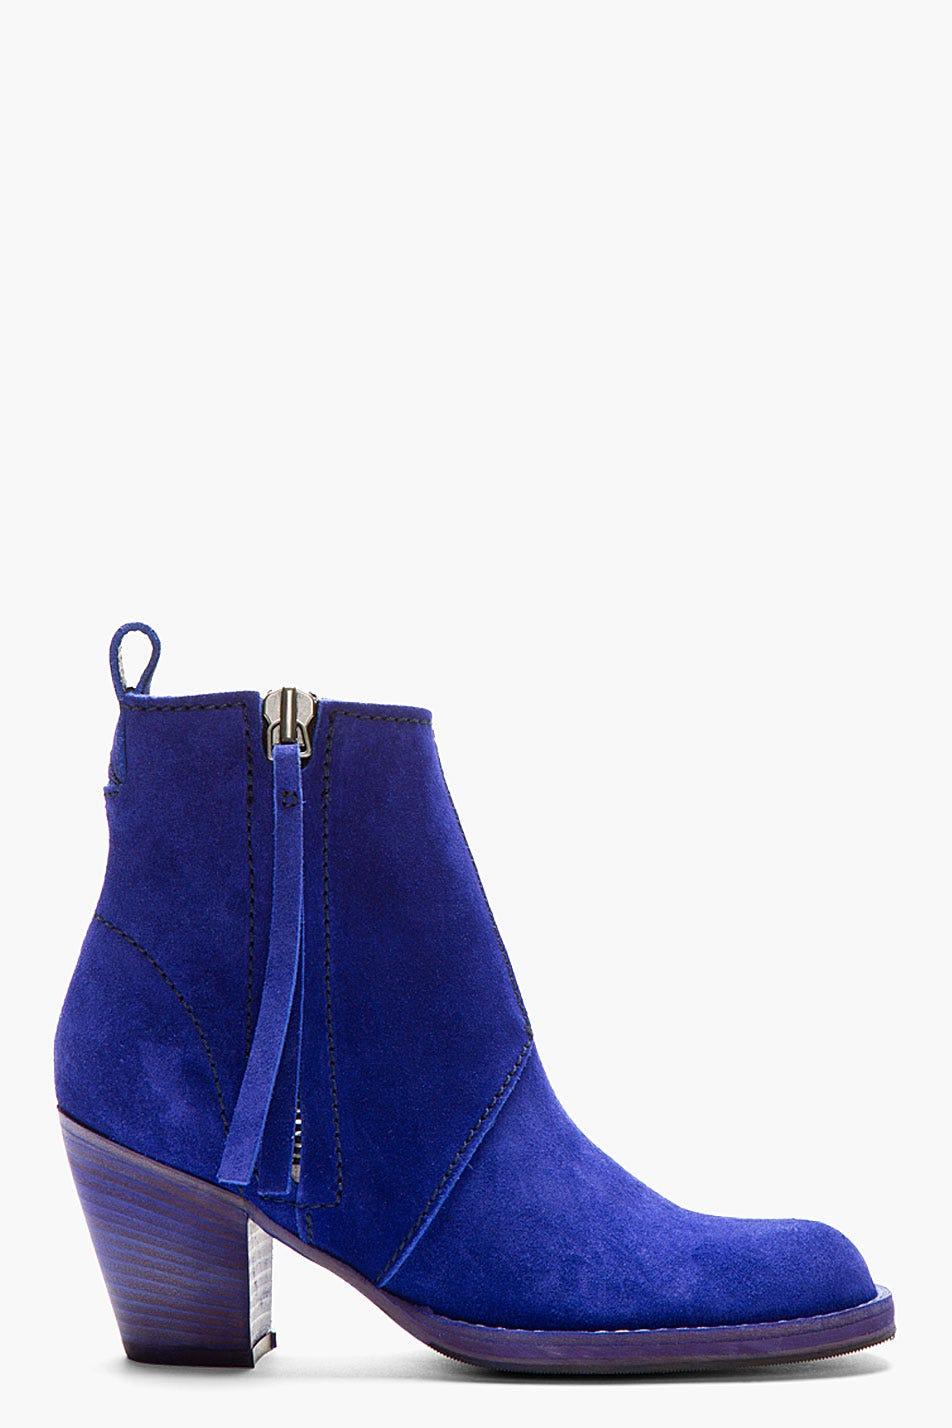 fbde8262cde Indigo Blue Cuban-Heeled Suede Ankle Boot